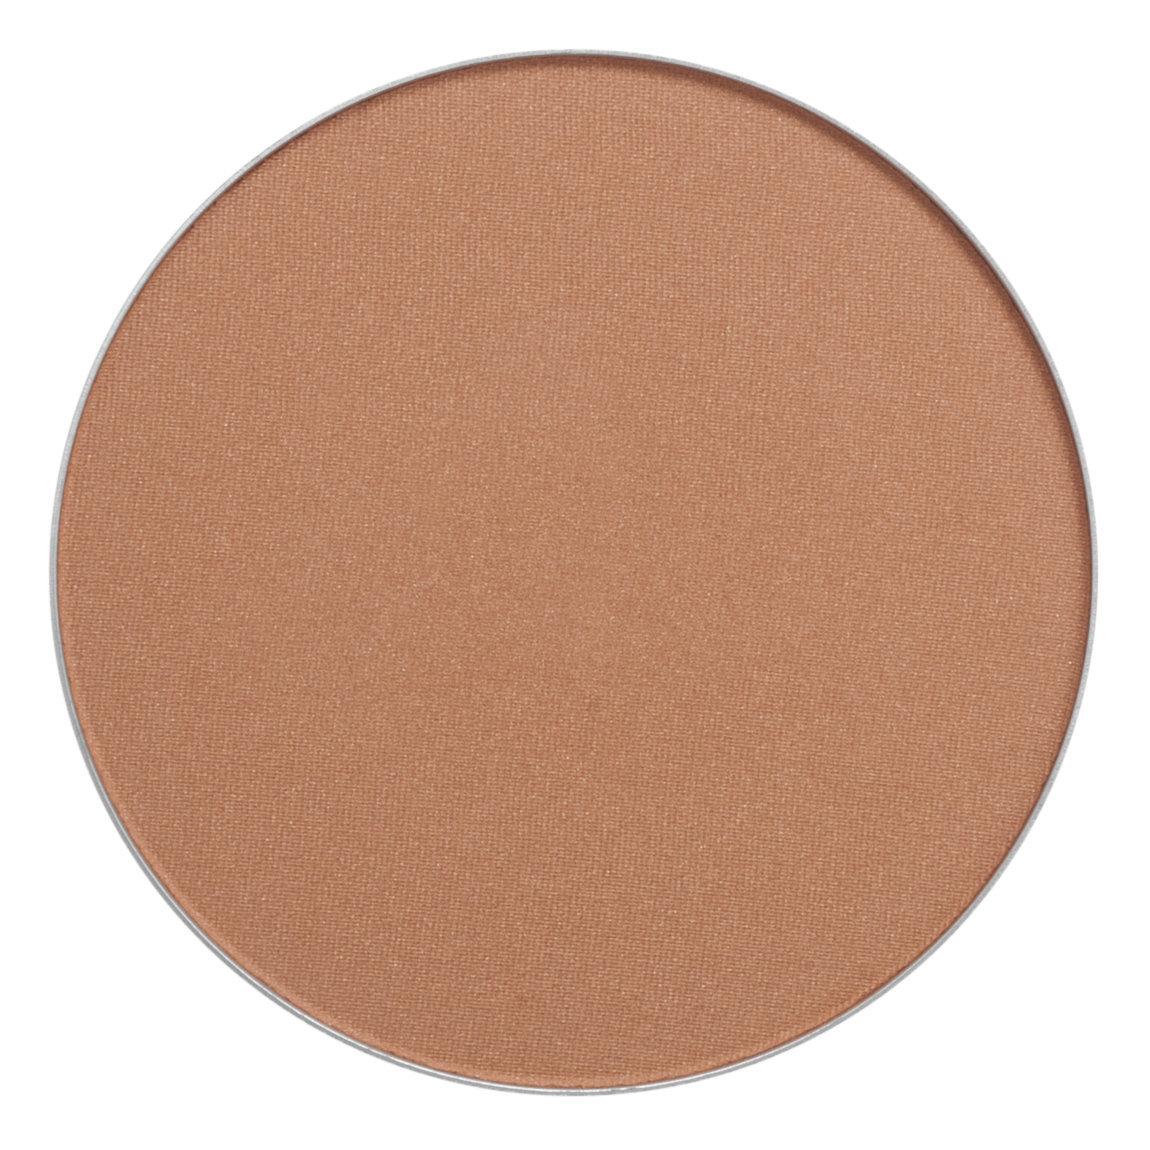 Inglot Cosmetics Freedom System AMC Bronzing Powder Round 75 product swatch.